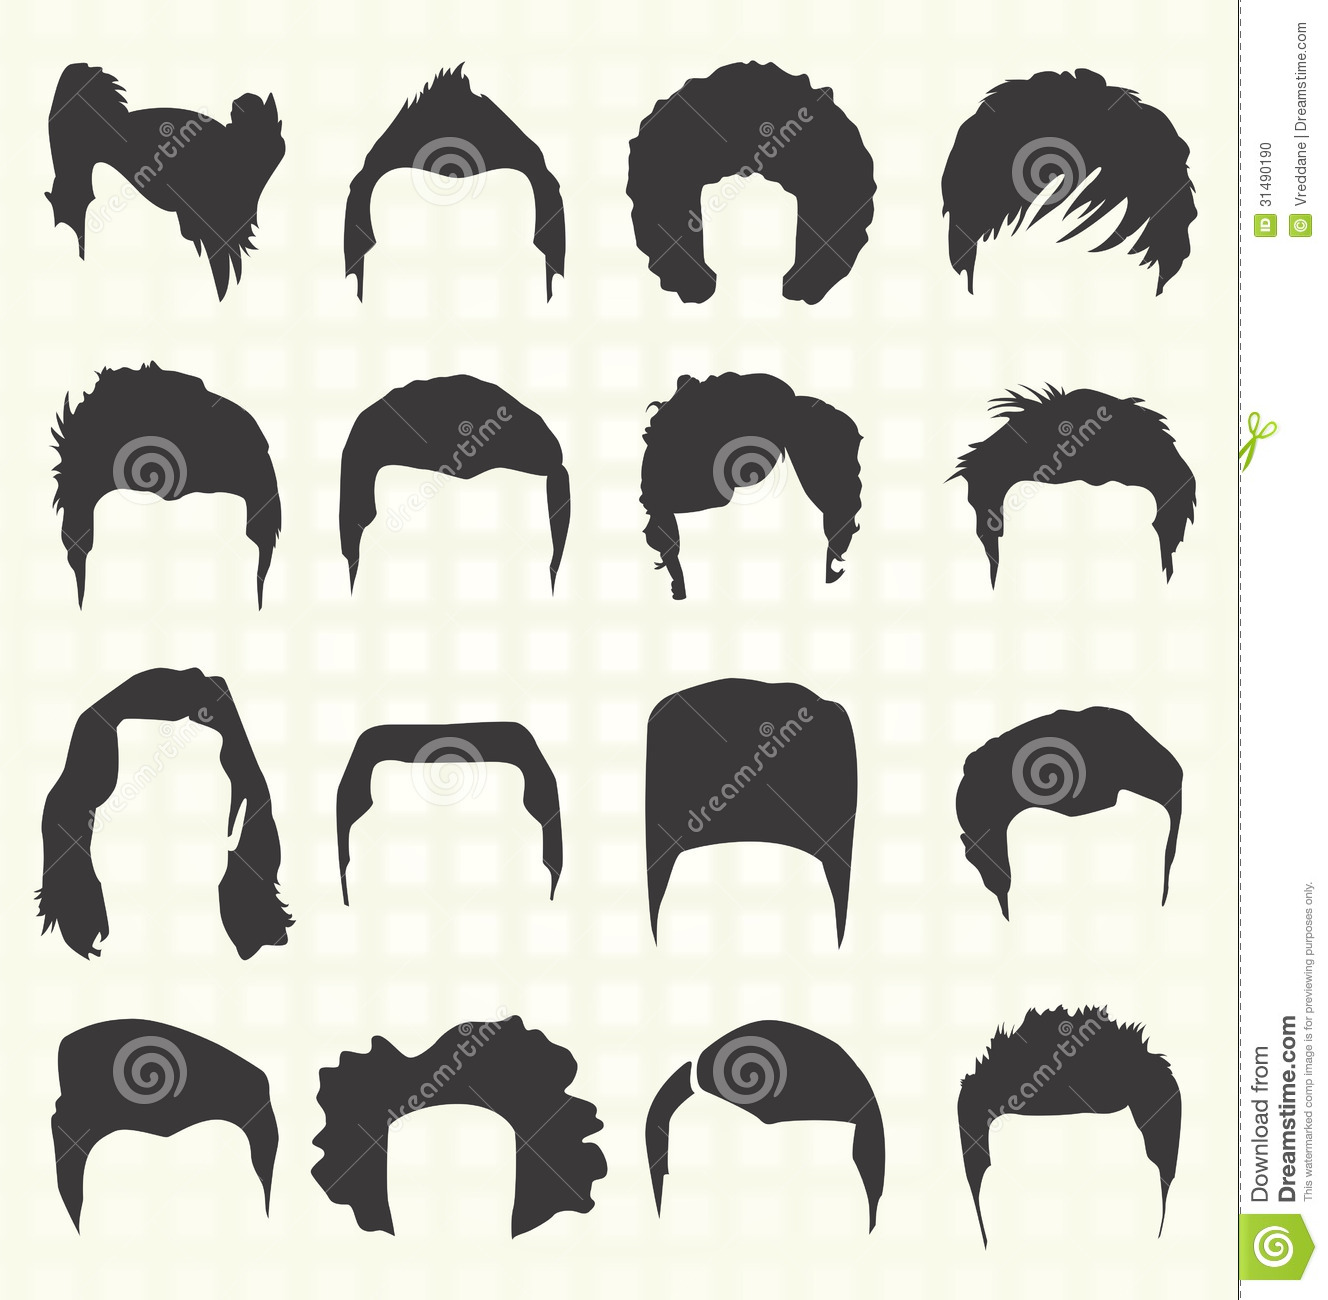 Dark Hair clipart guy Hair Comm hair wig guy